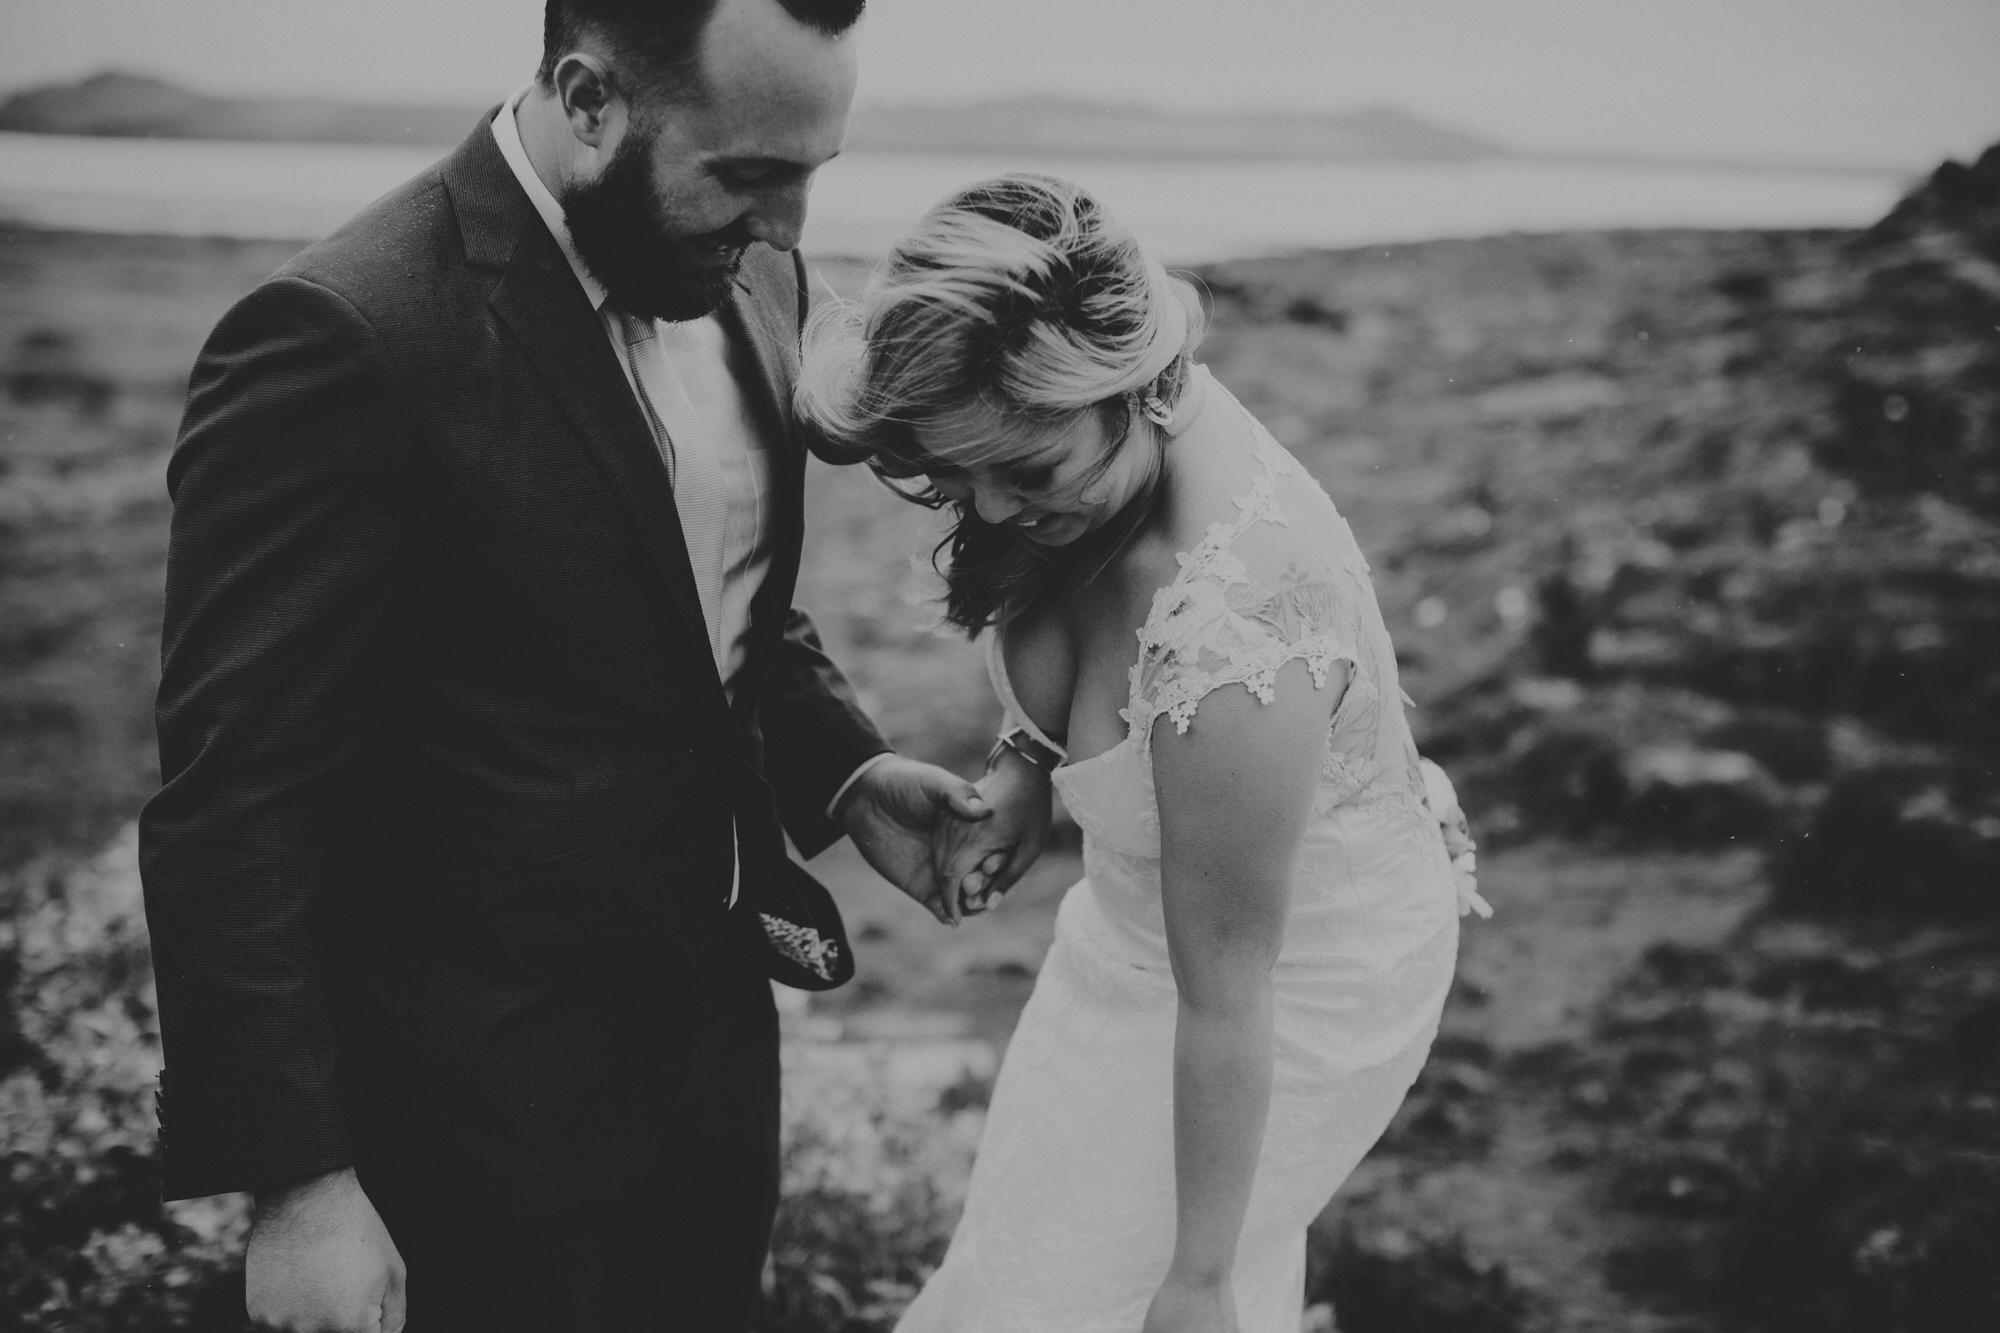 elopement photographer iceland ©Anne-claire Brun